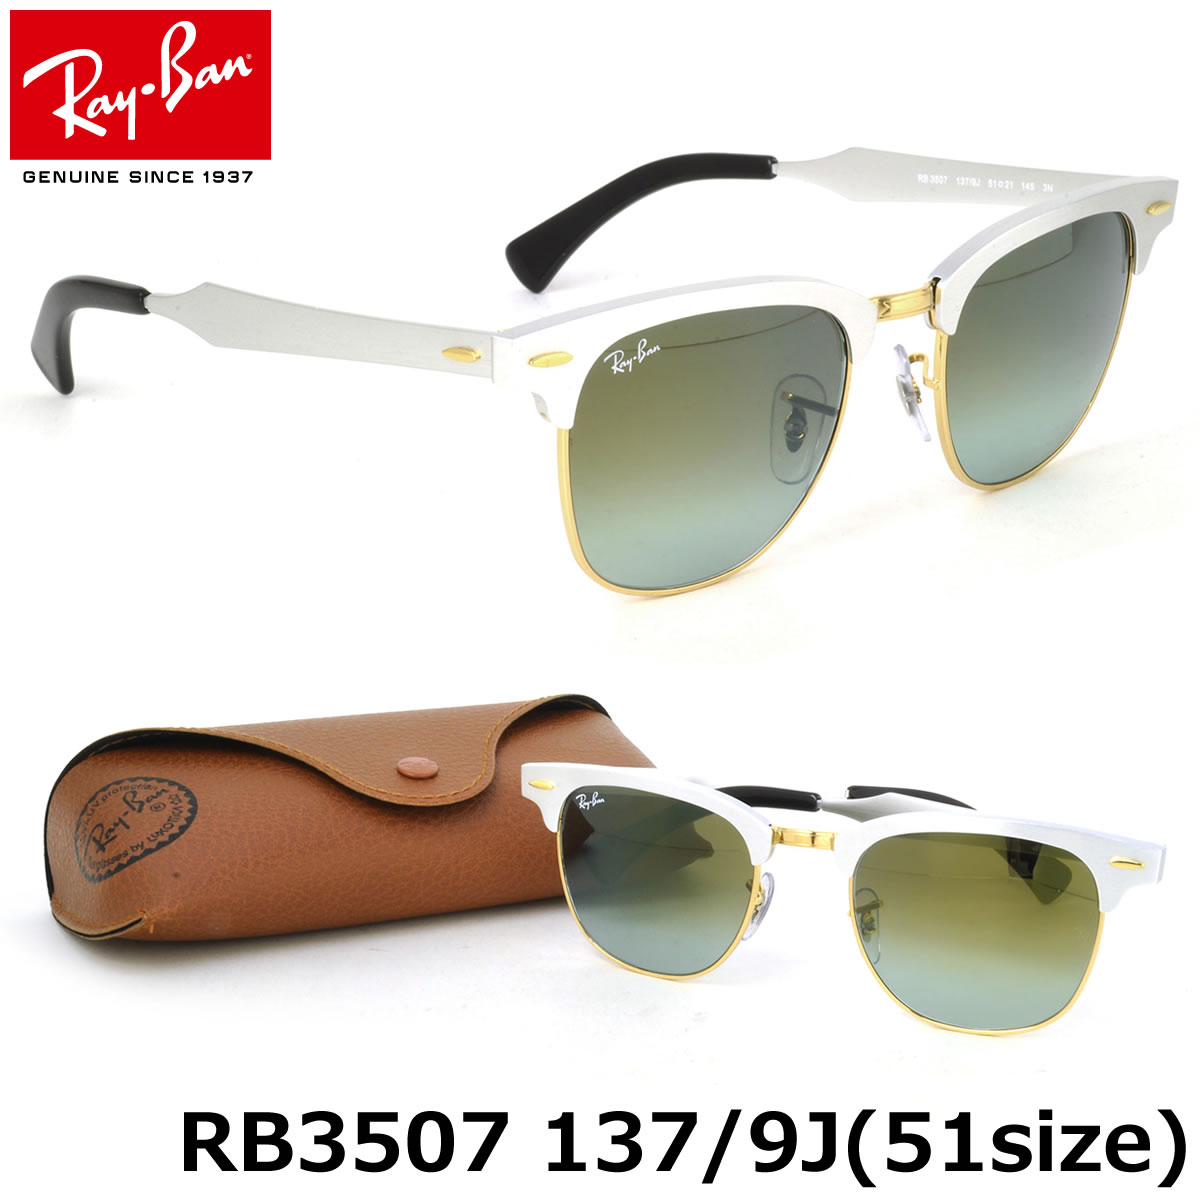 Ray Ban Rb3507 51   Louisiana Bucket Brigade bc86839027